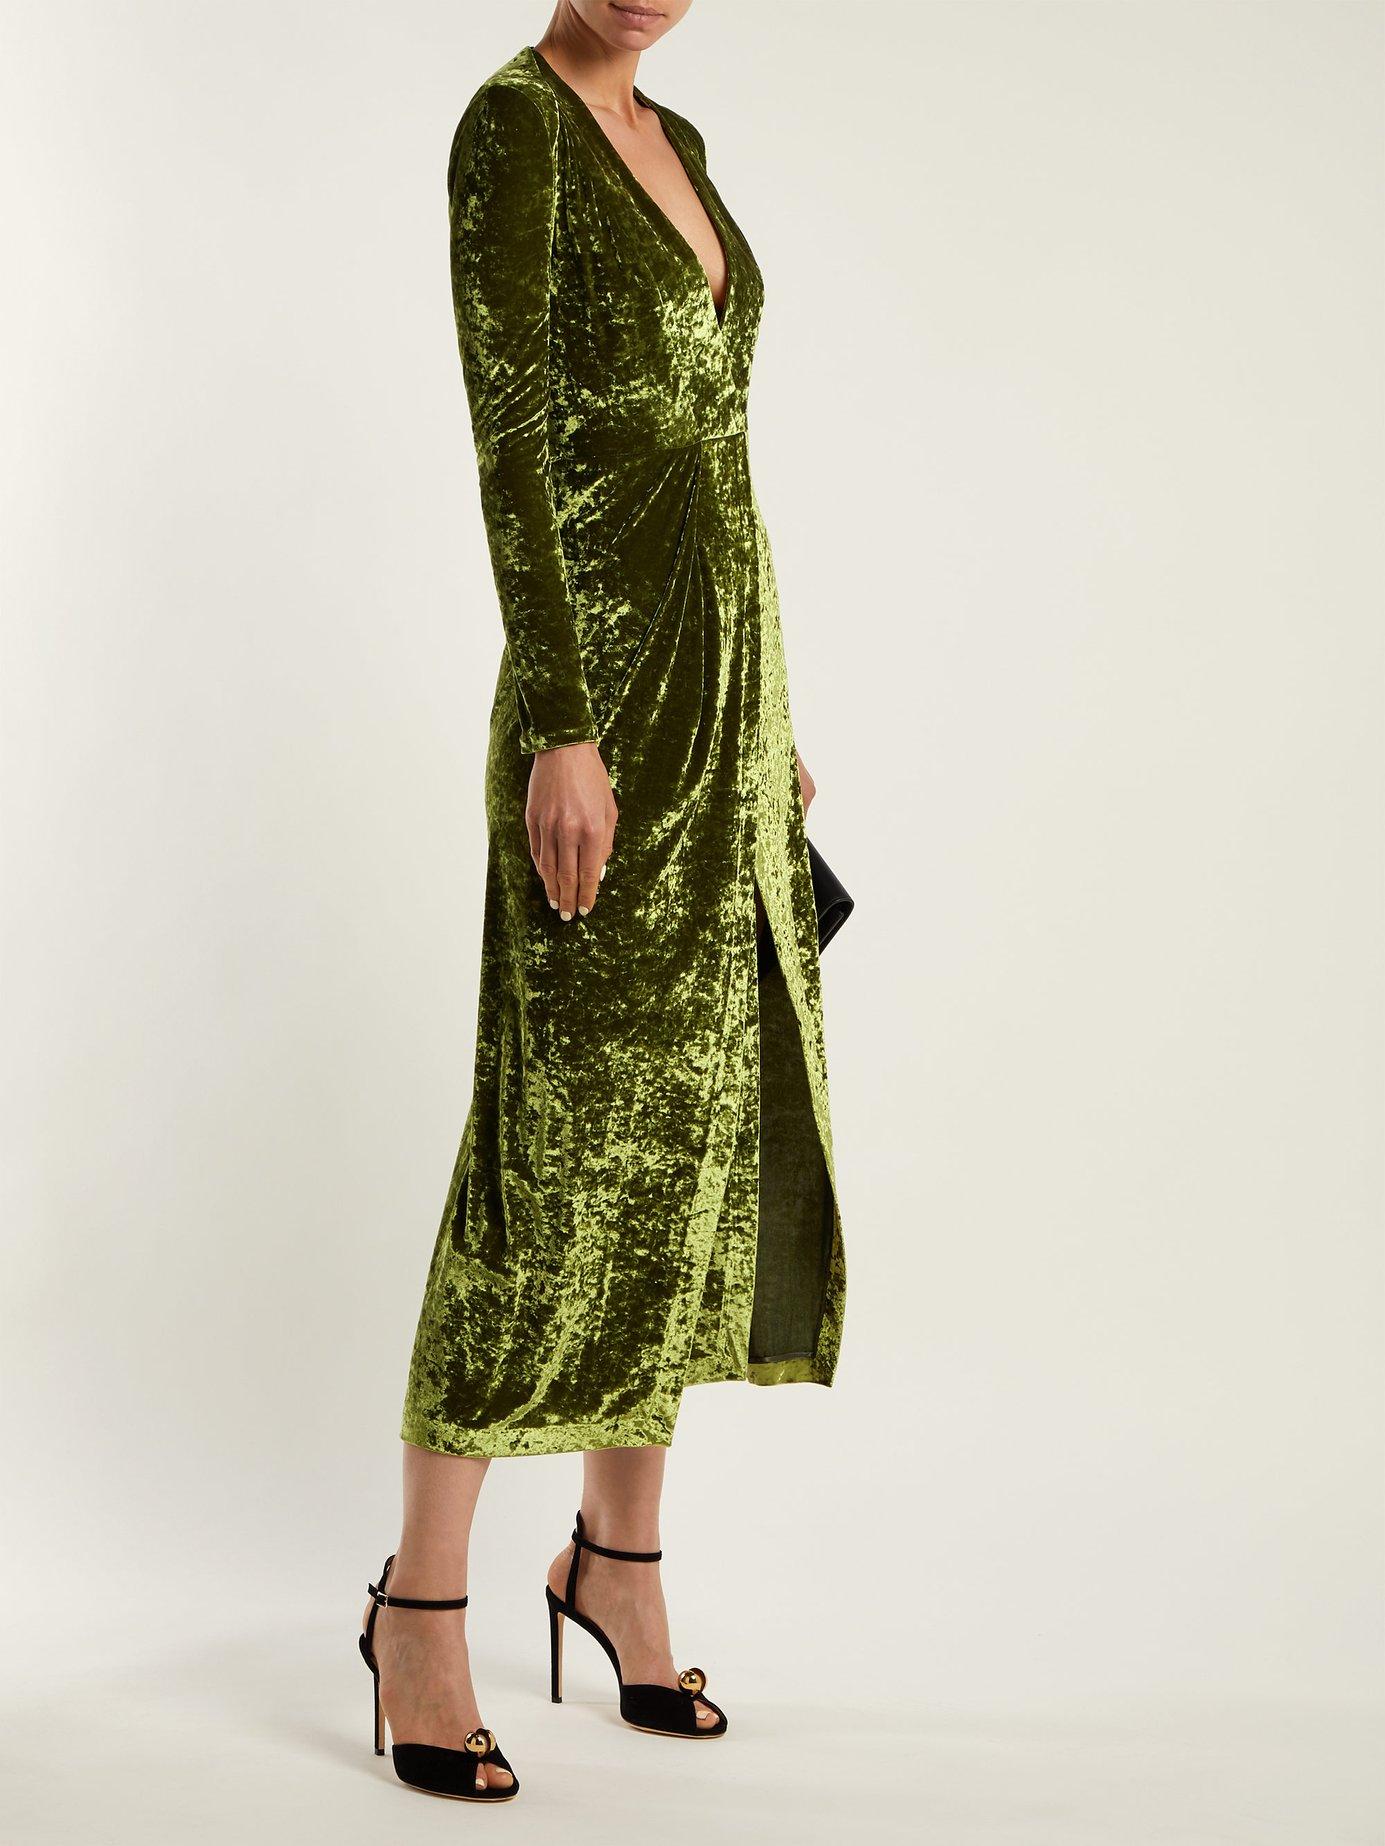 Cloud hammered-velvet dress by Galvan